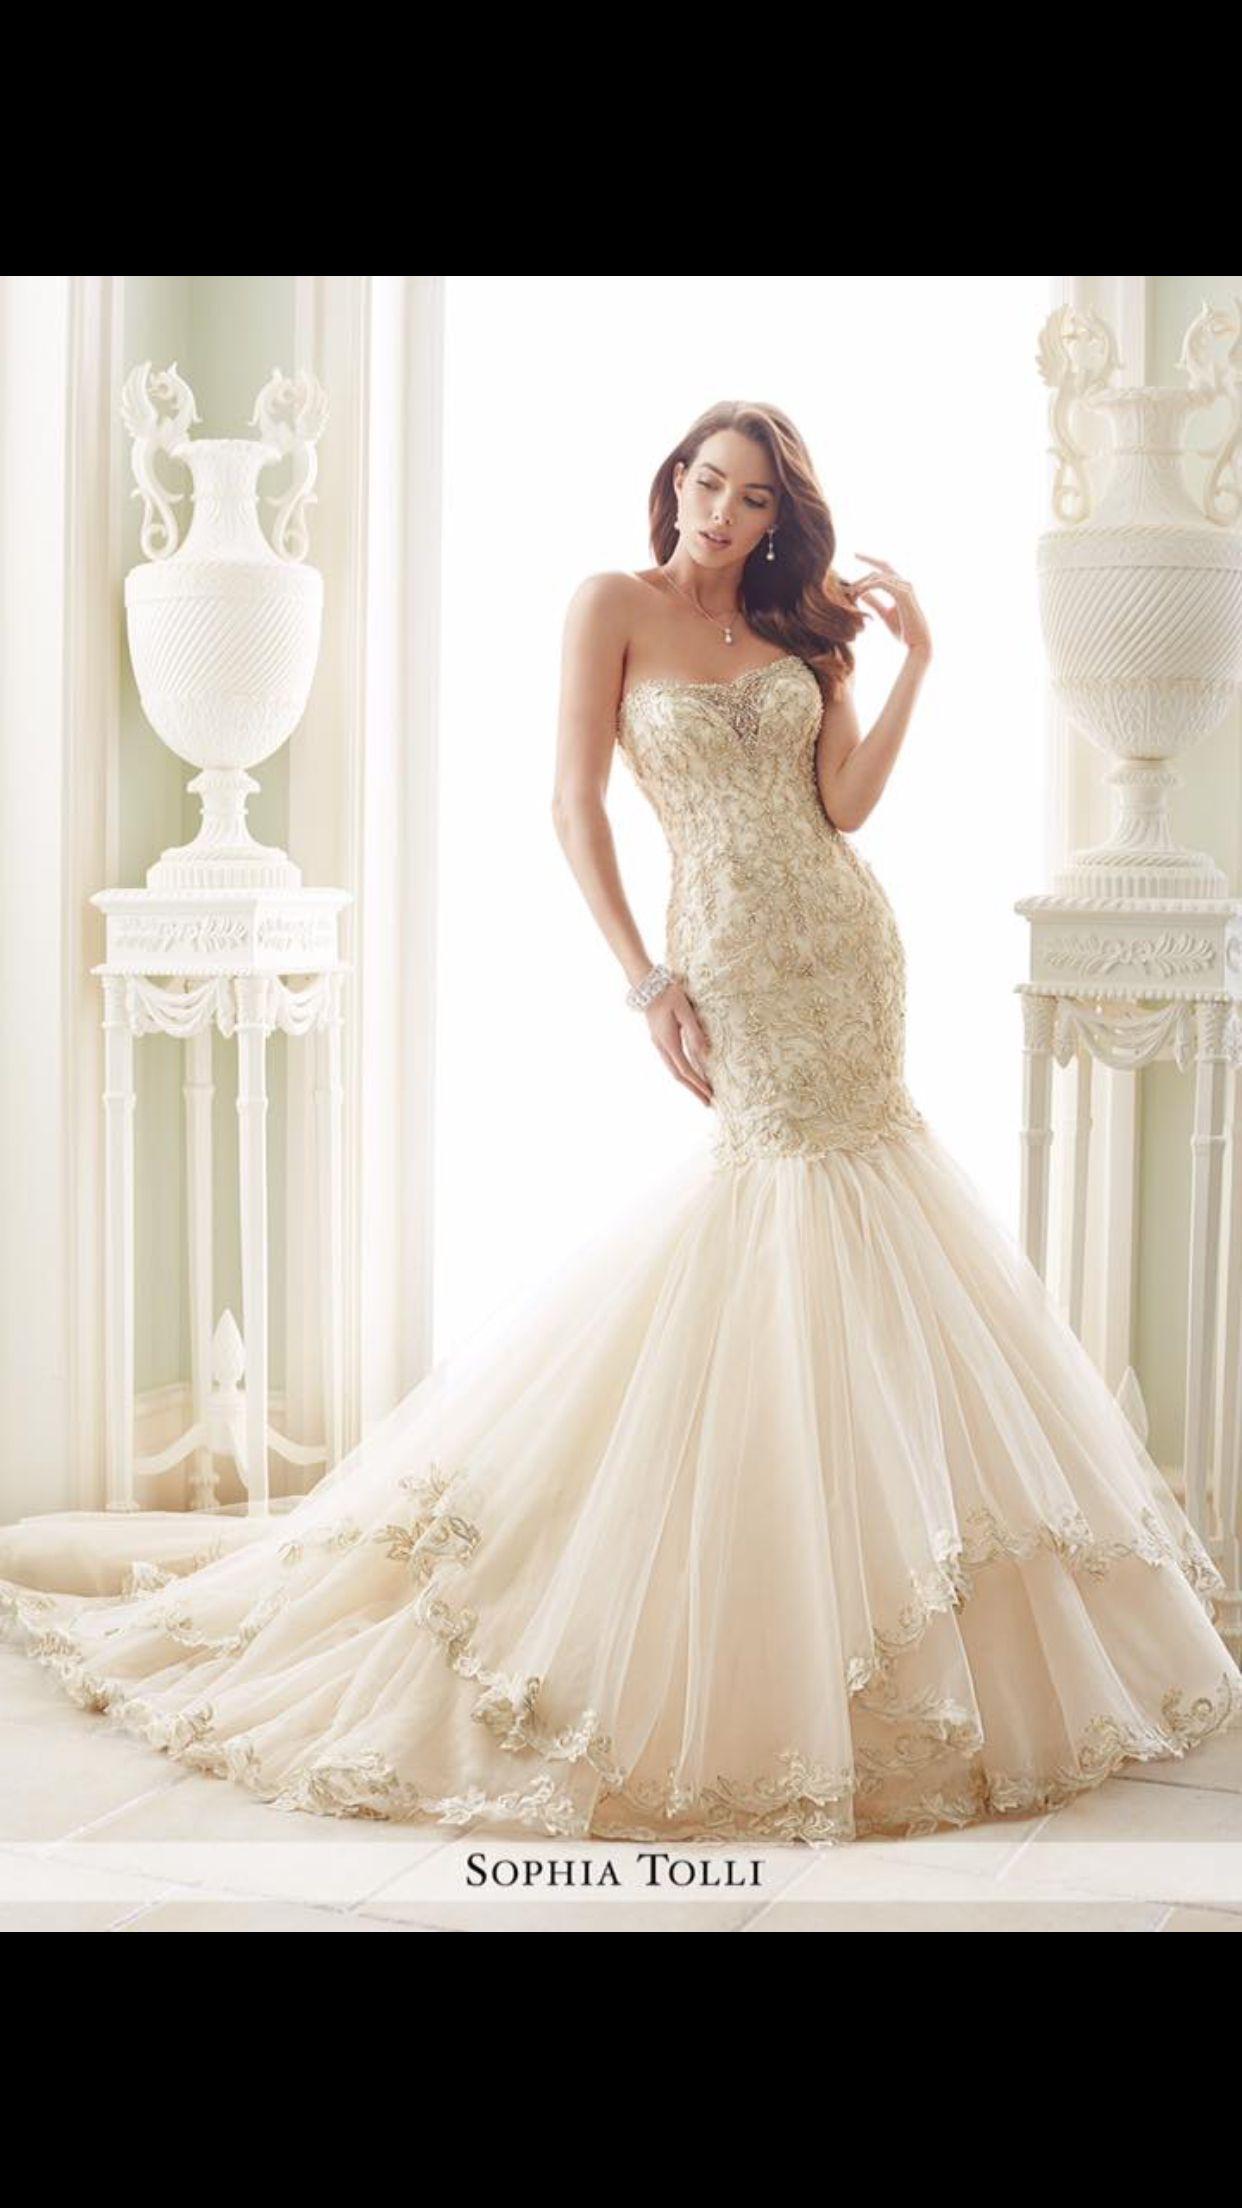 Sophia Tolli mermaid wedding dress in Gold & blush